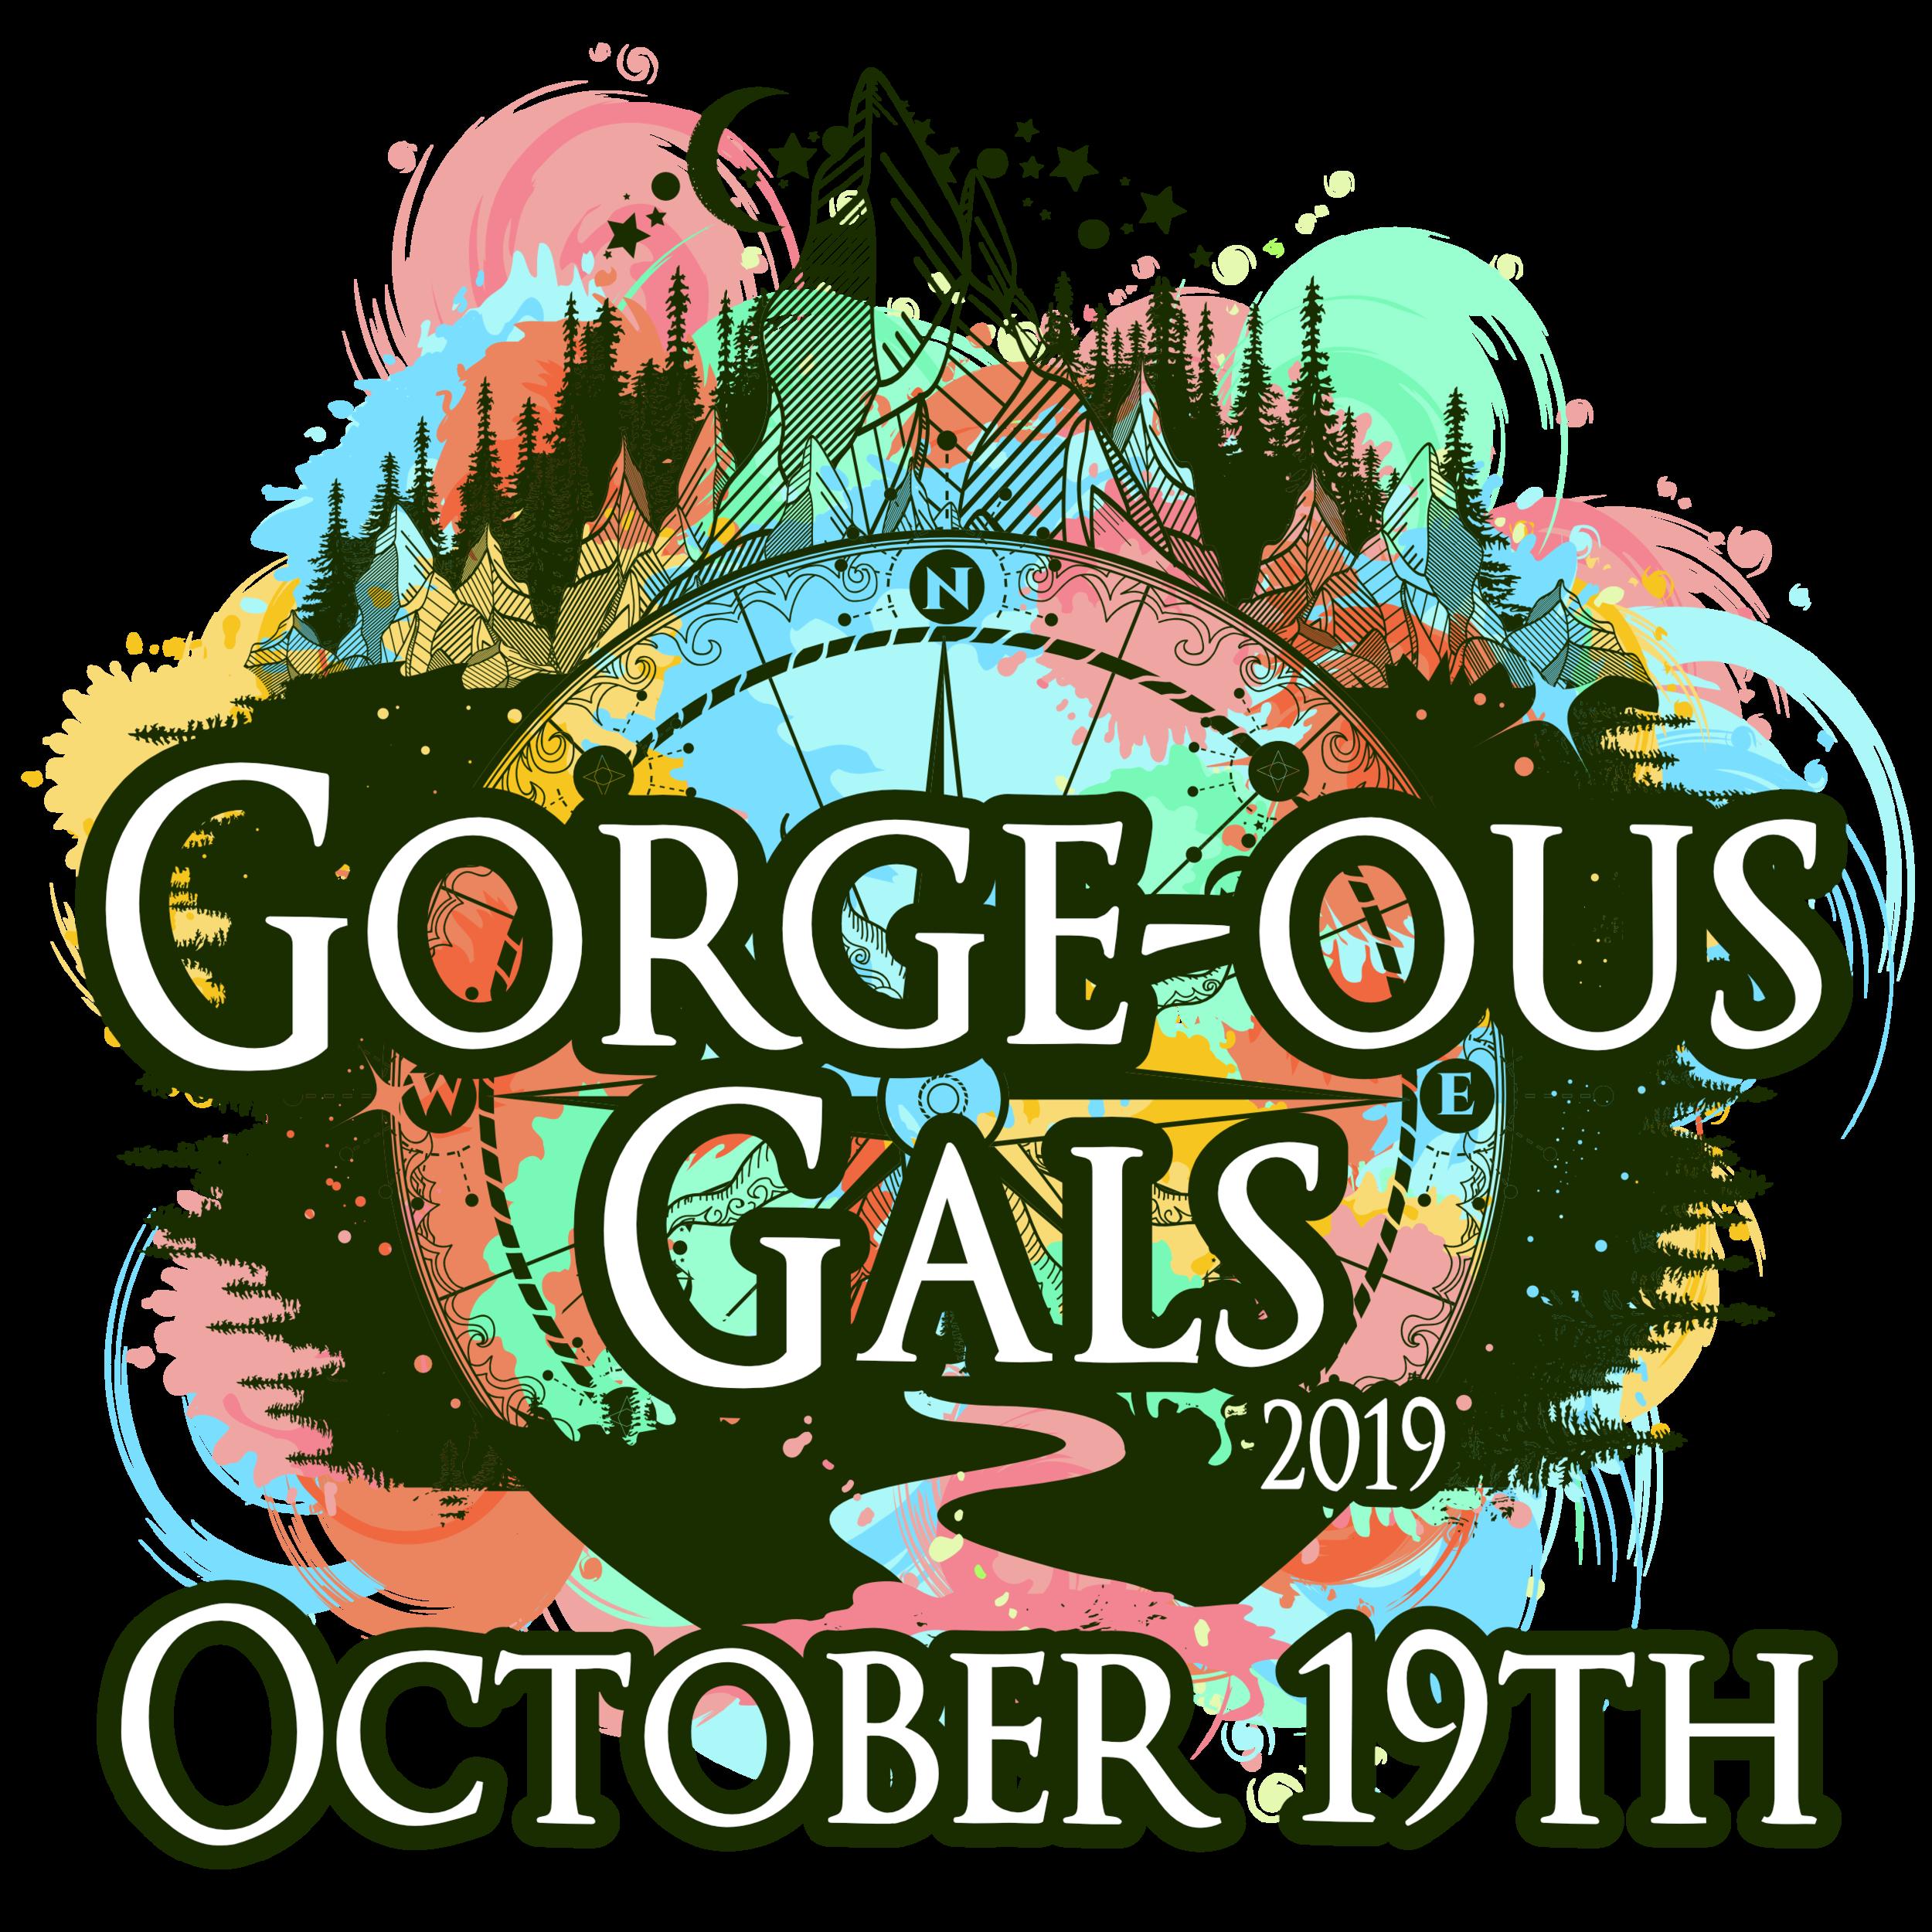 gorge-ous gals 2019 web photo.png